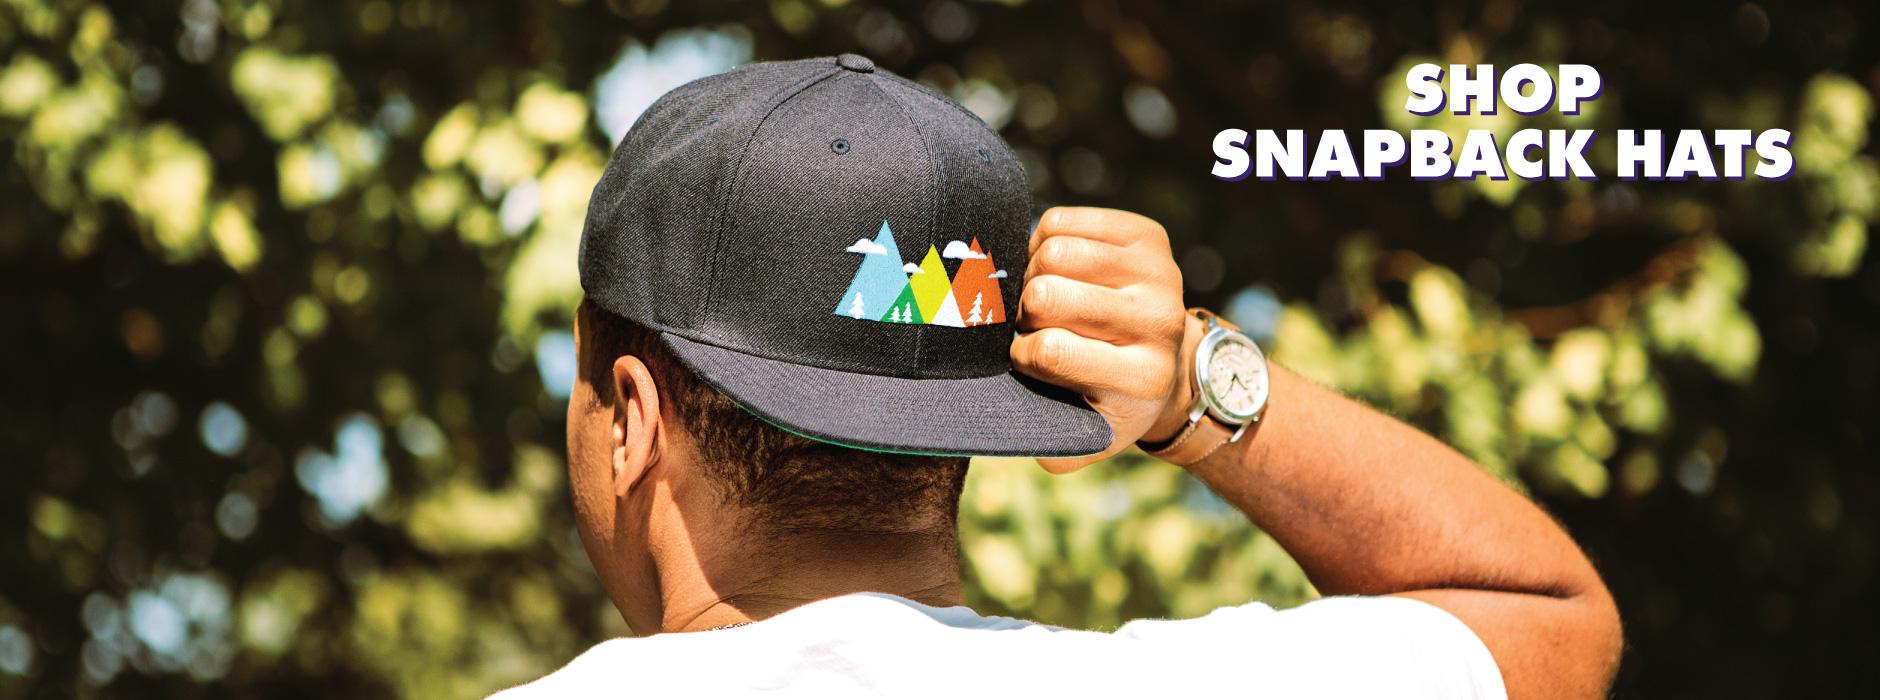 Threadless Headwear - Shop Snapback Hats